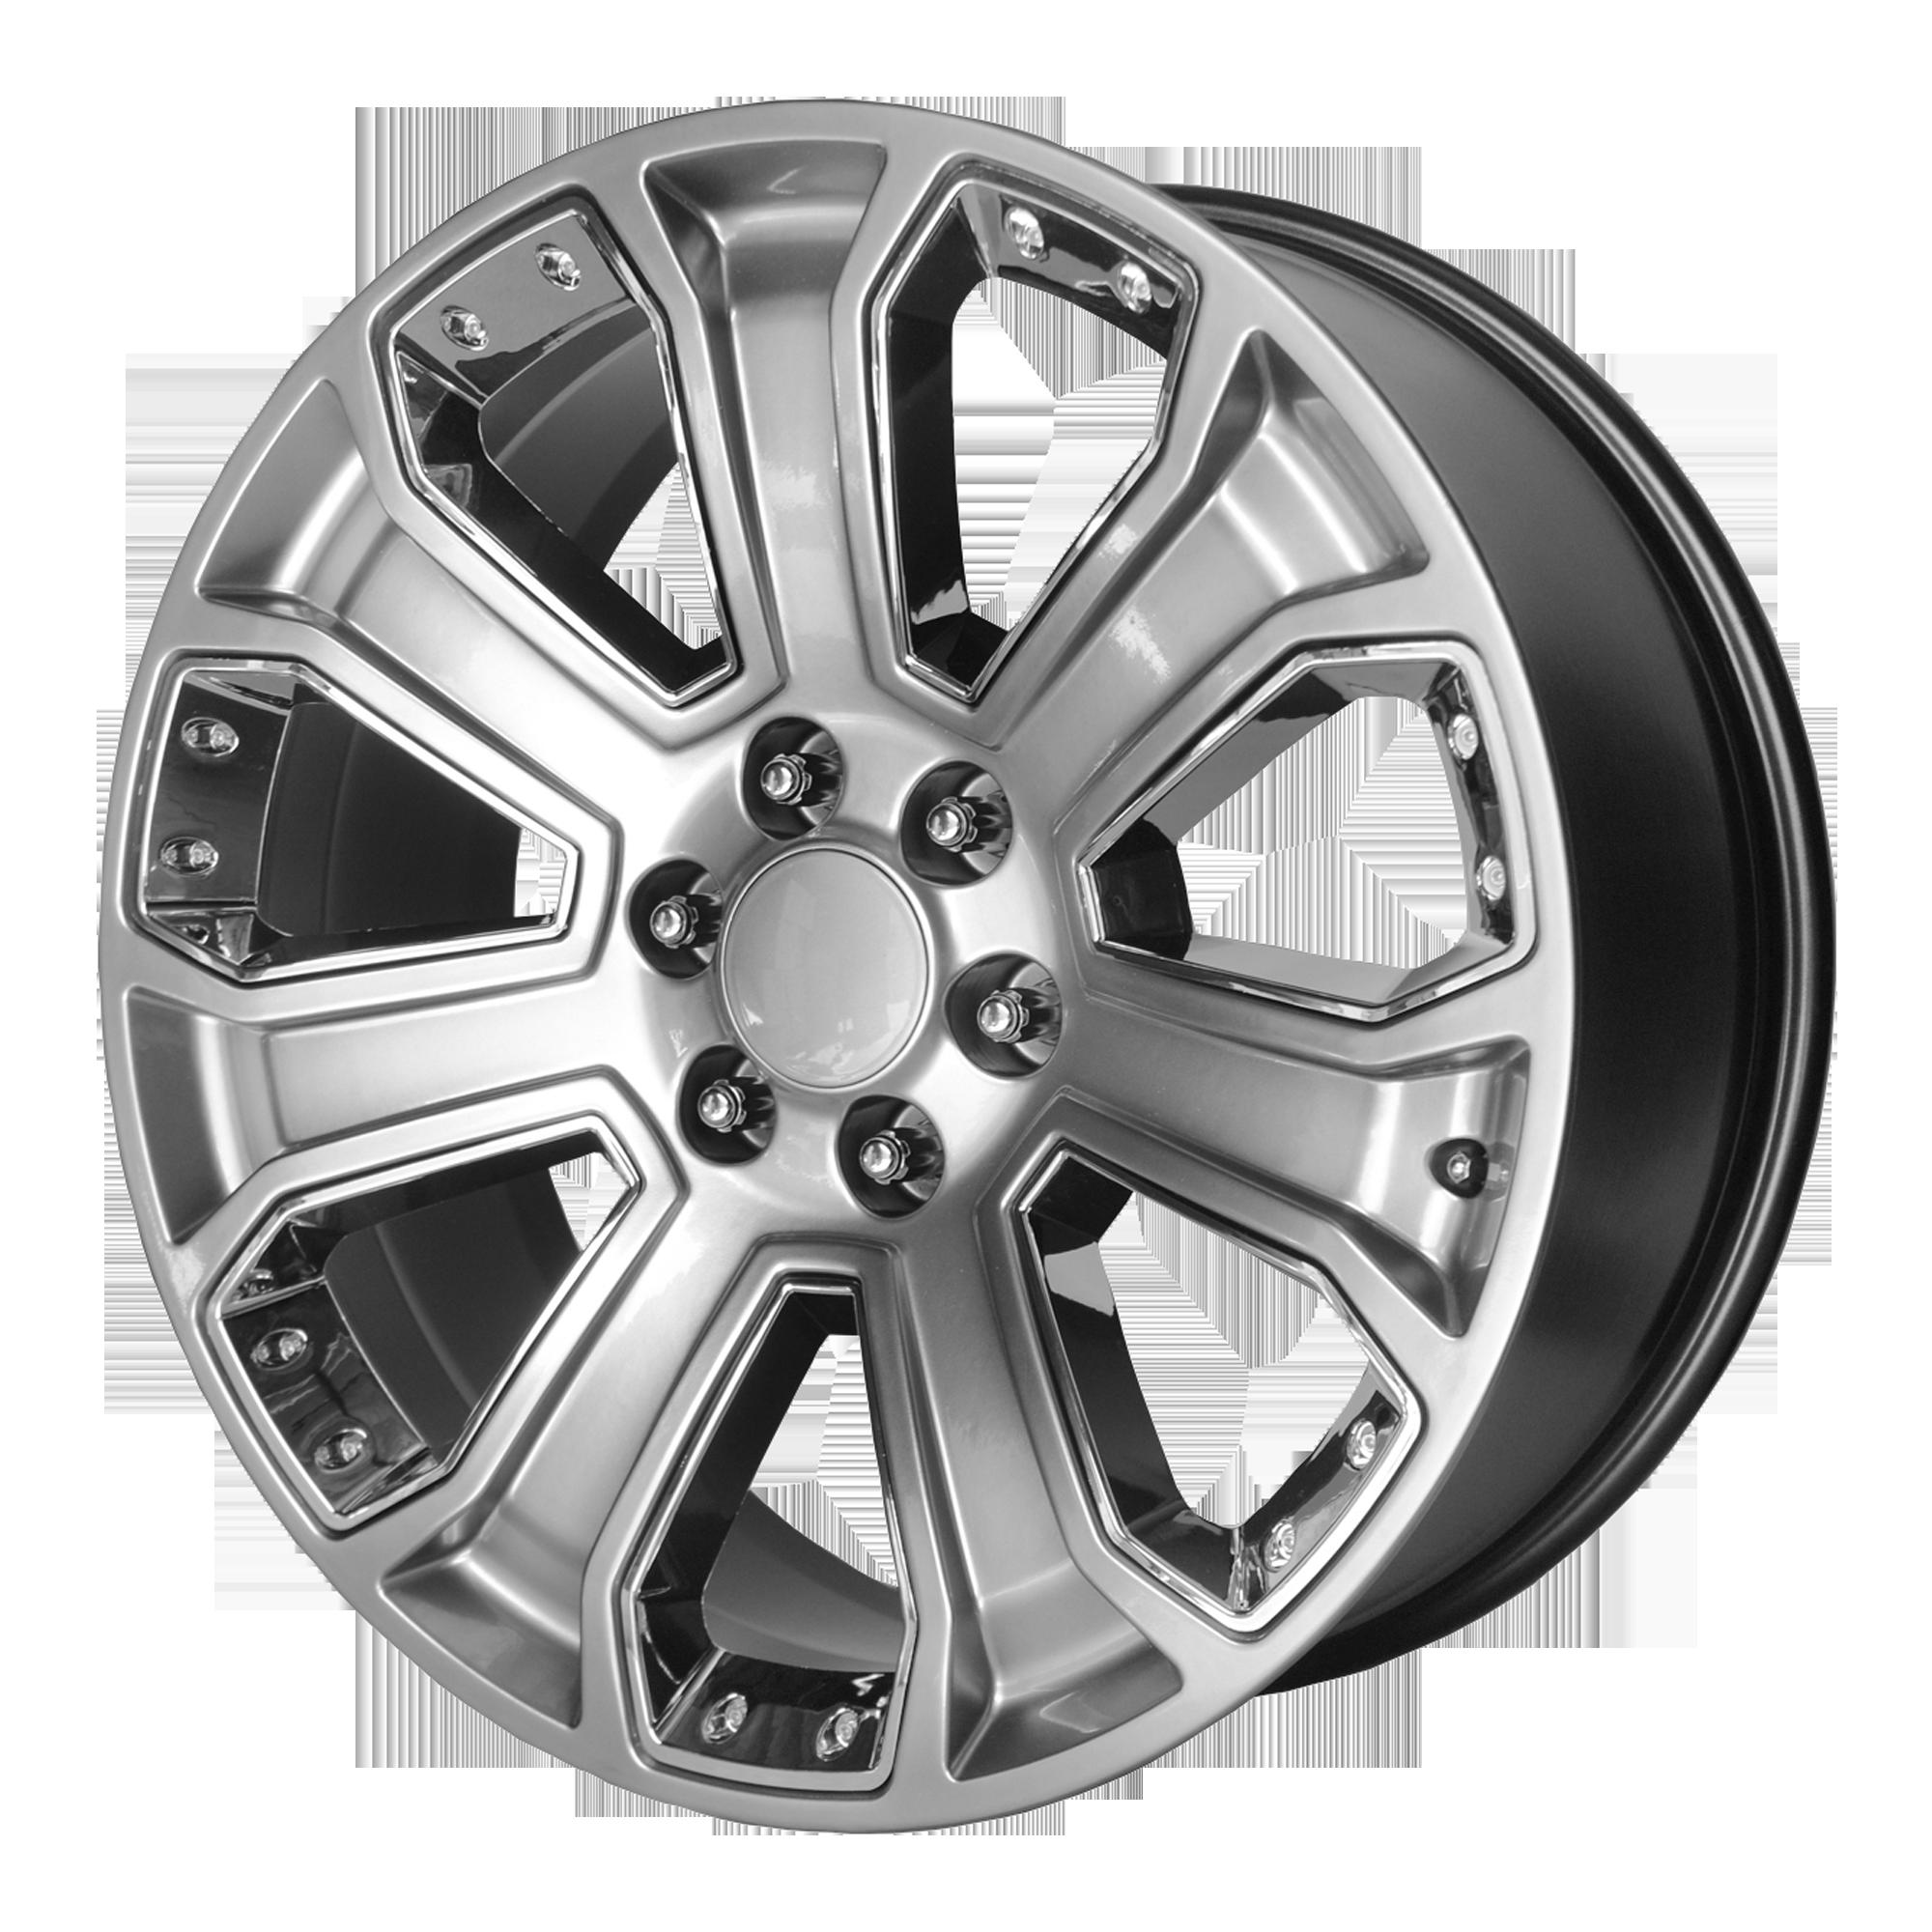 OE Creations Replica Wheels OE Creations PR162 Silver w/ Chrome Accents